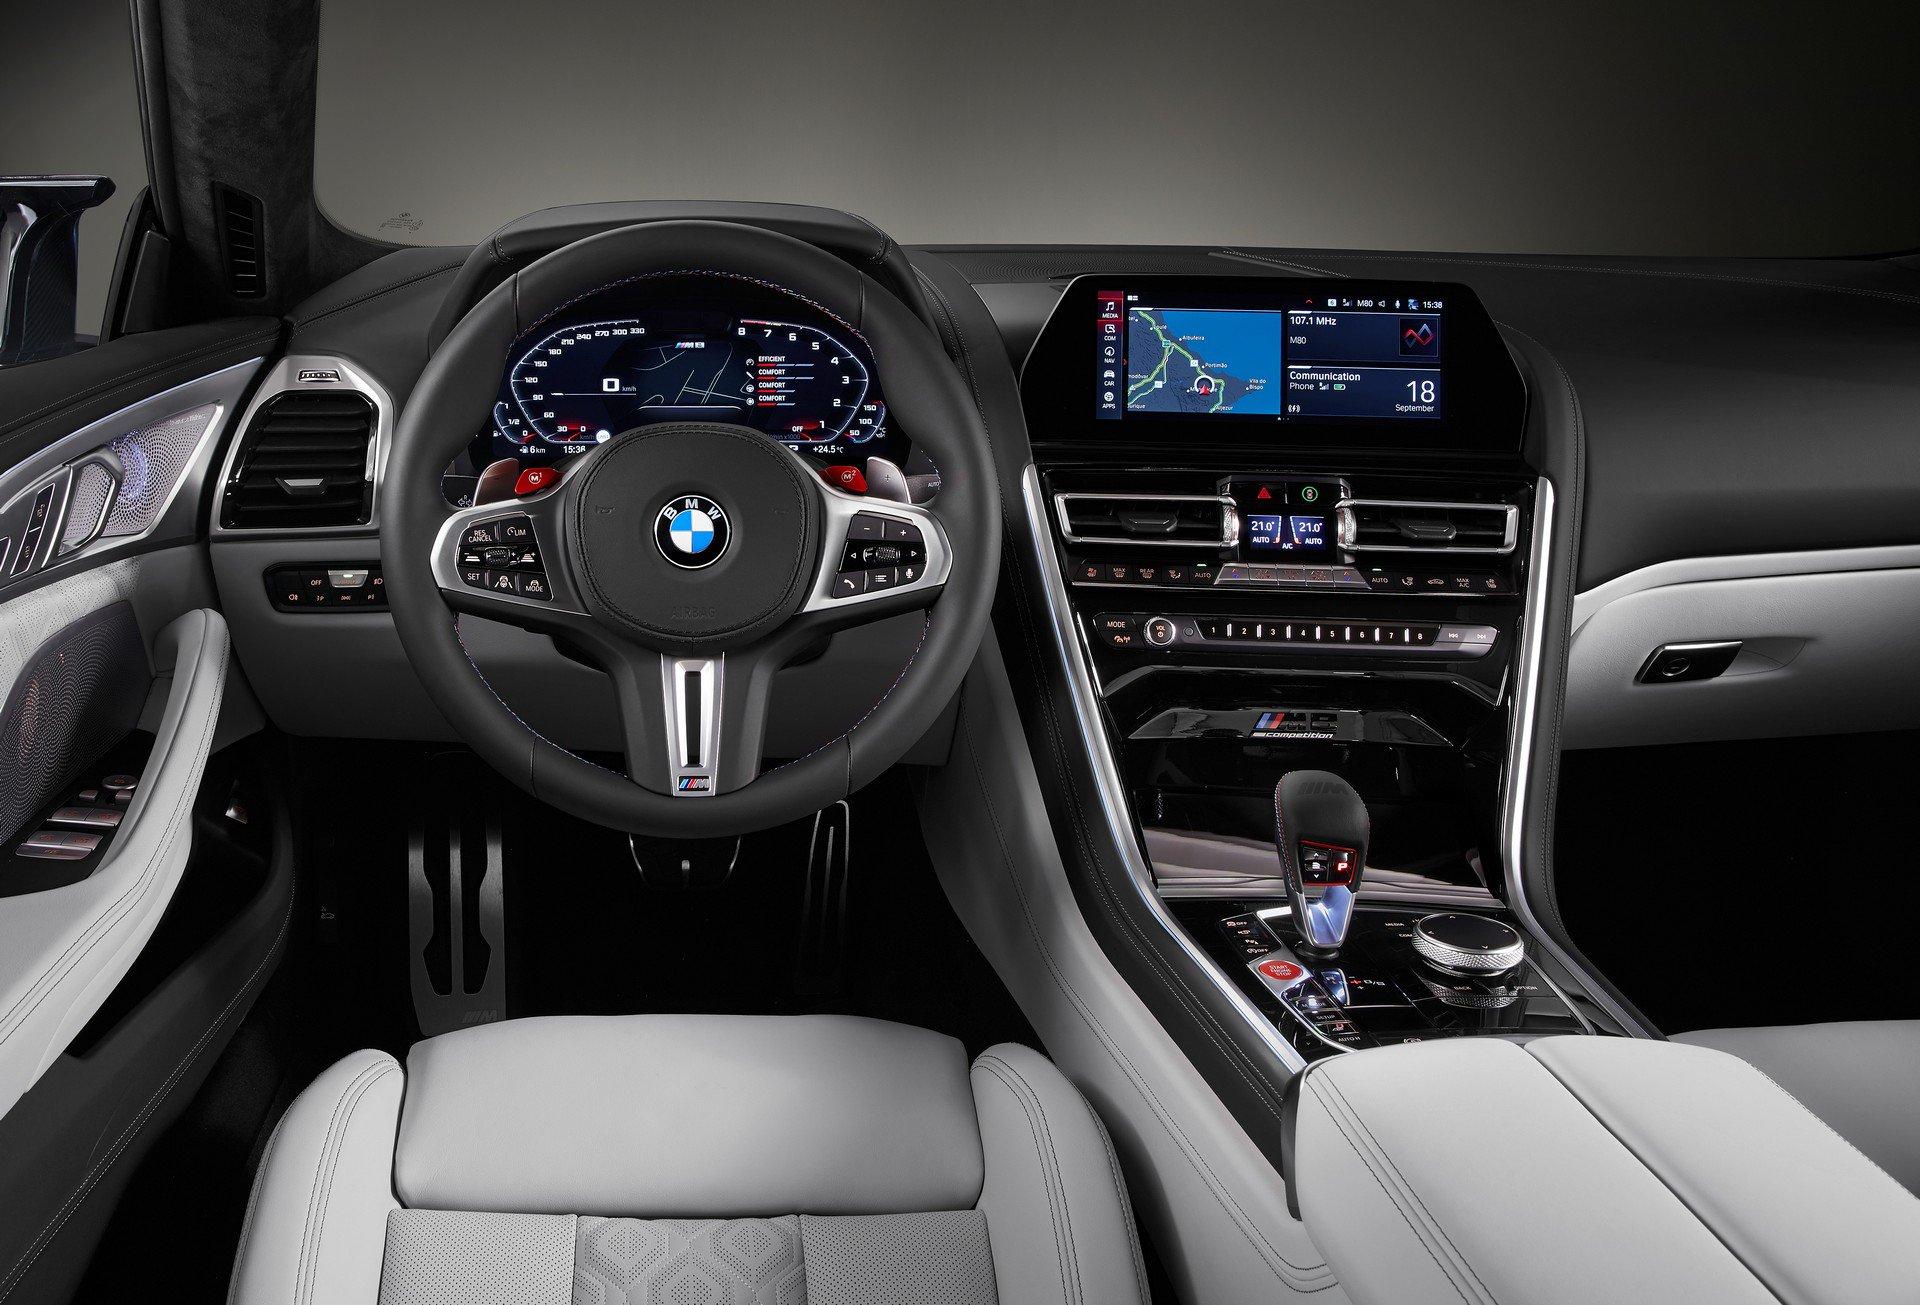 2020-bmw-m8-gran-coupe-6.jpg